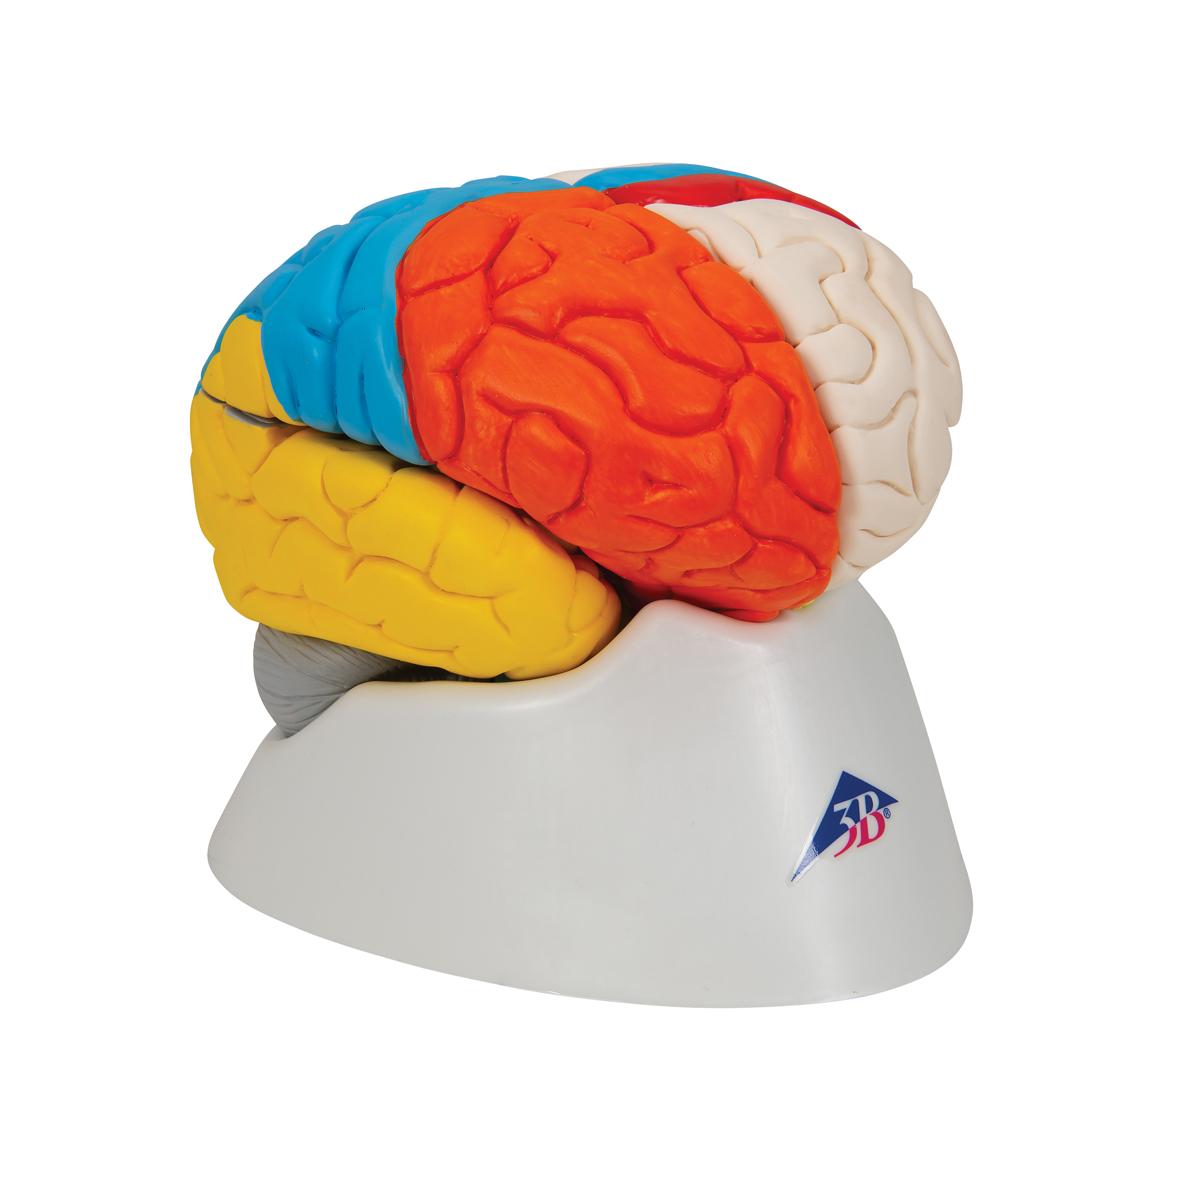 Anatomical Teaching Models Plastic Human Brain Models